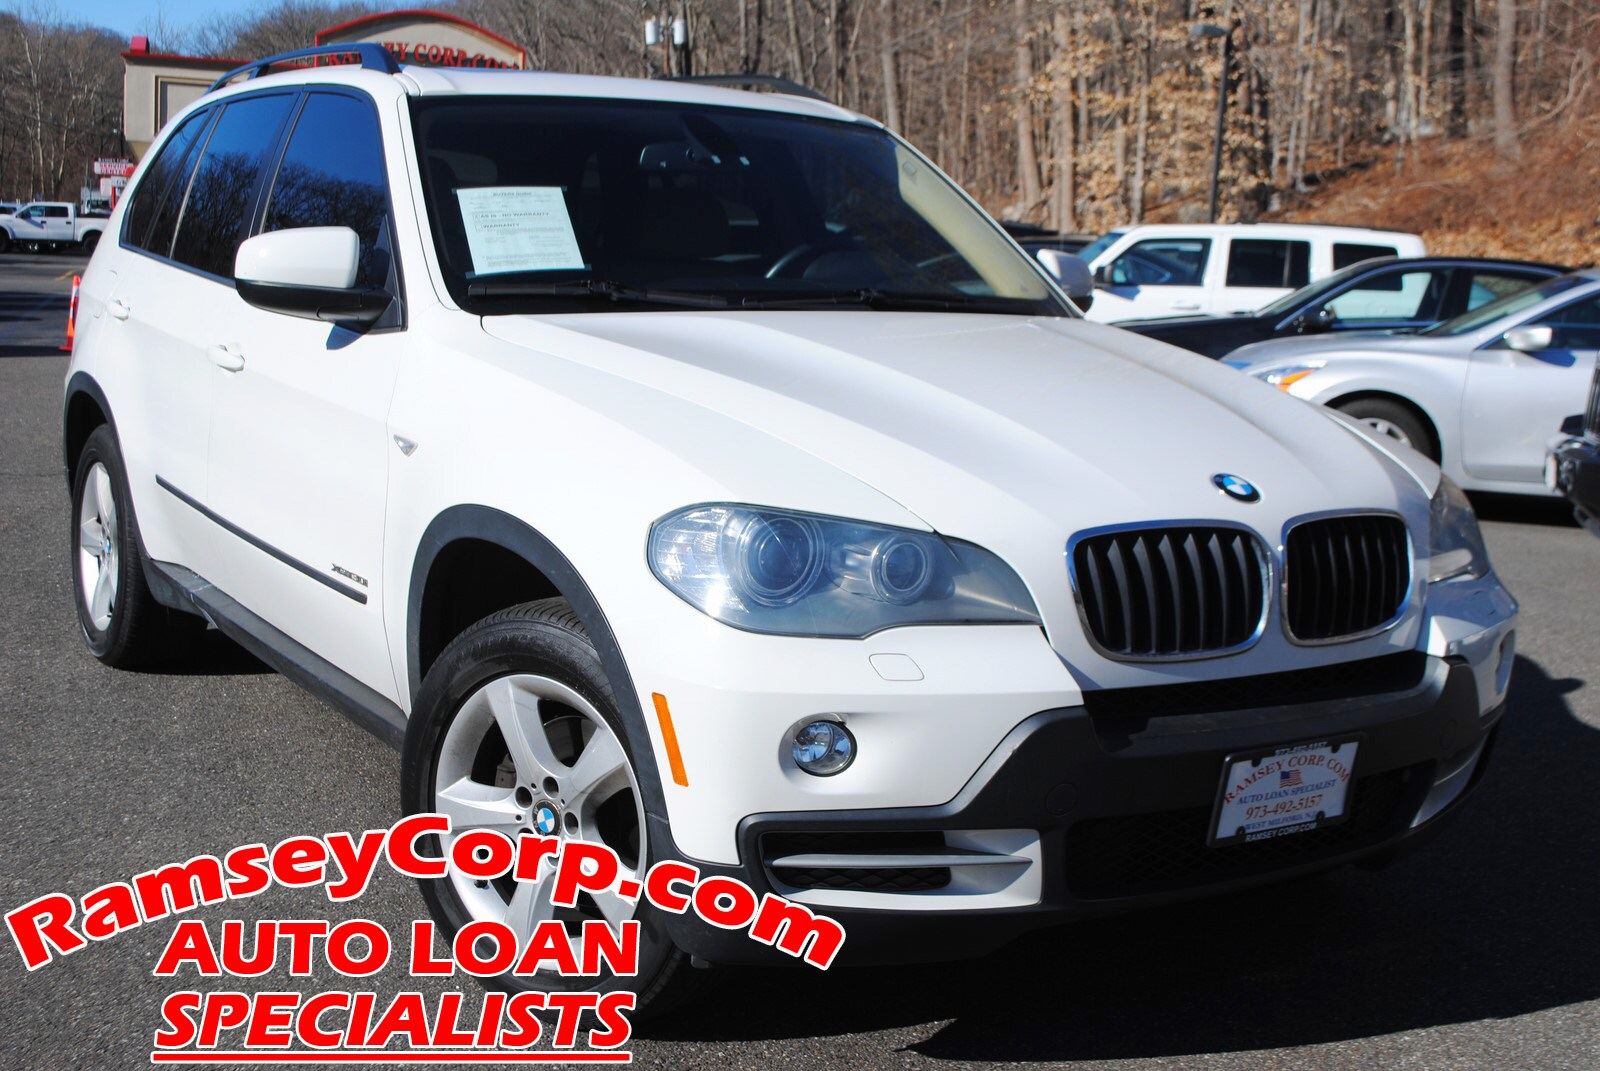 2009 BMW X5 xDrive30i 3.0 SAV